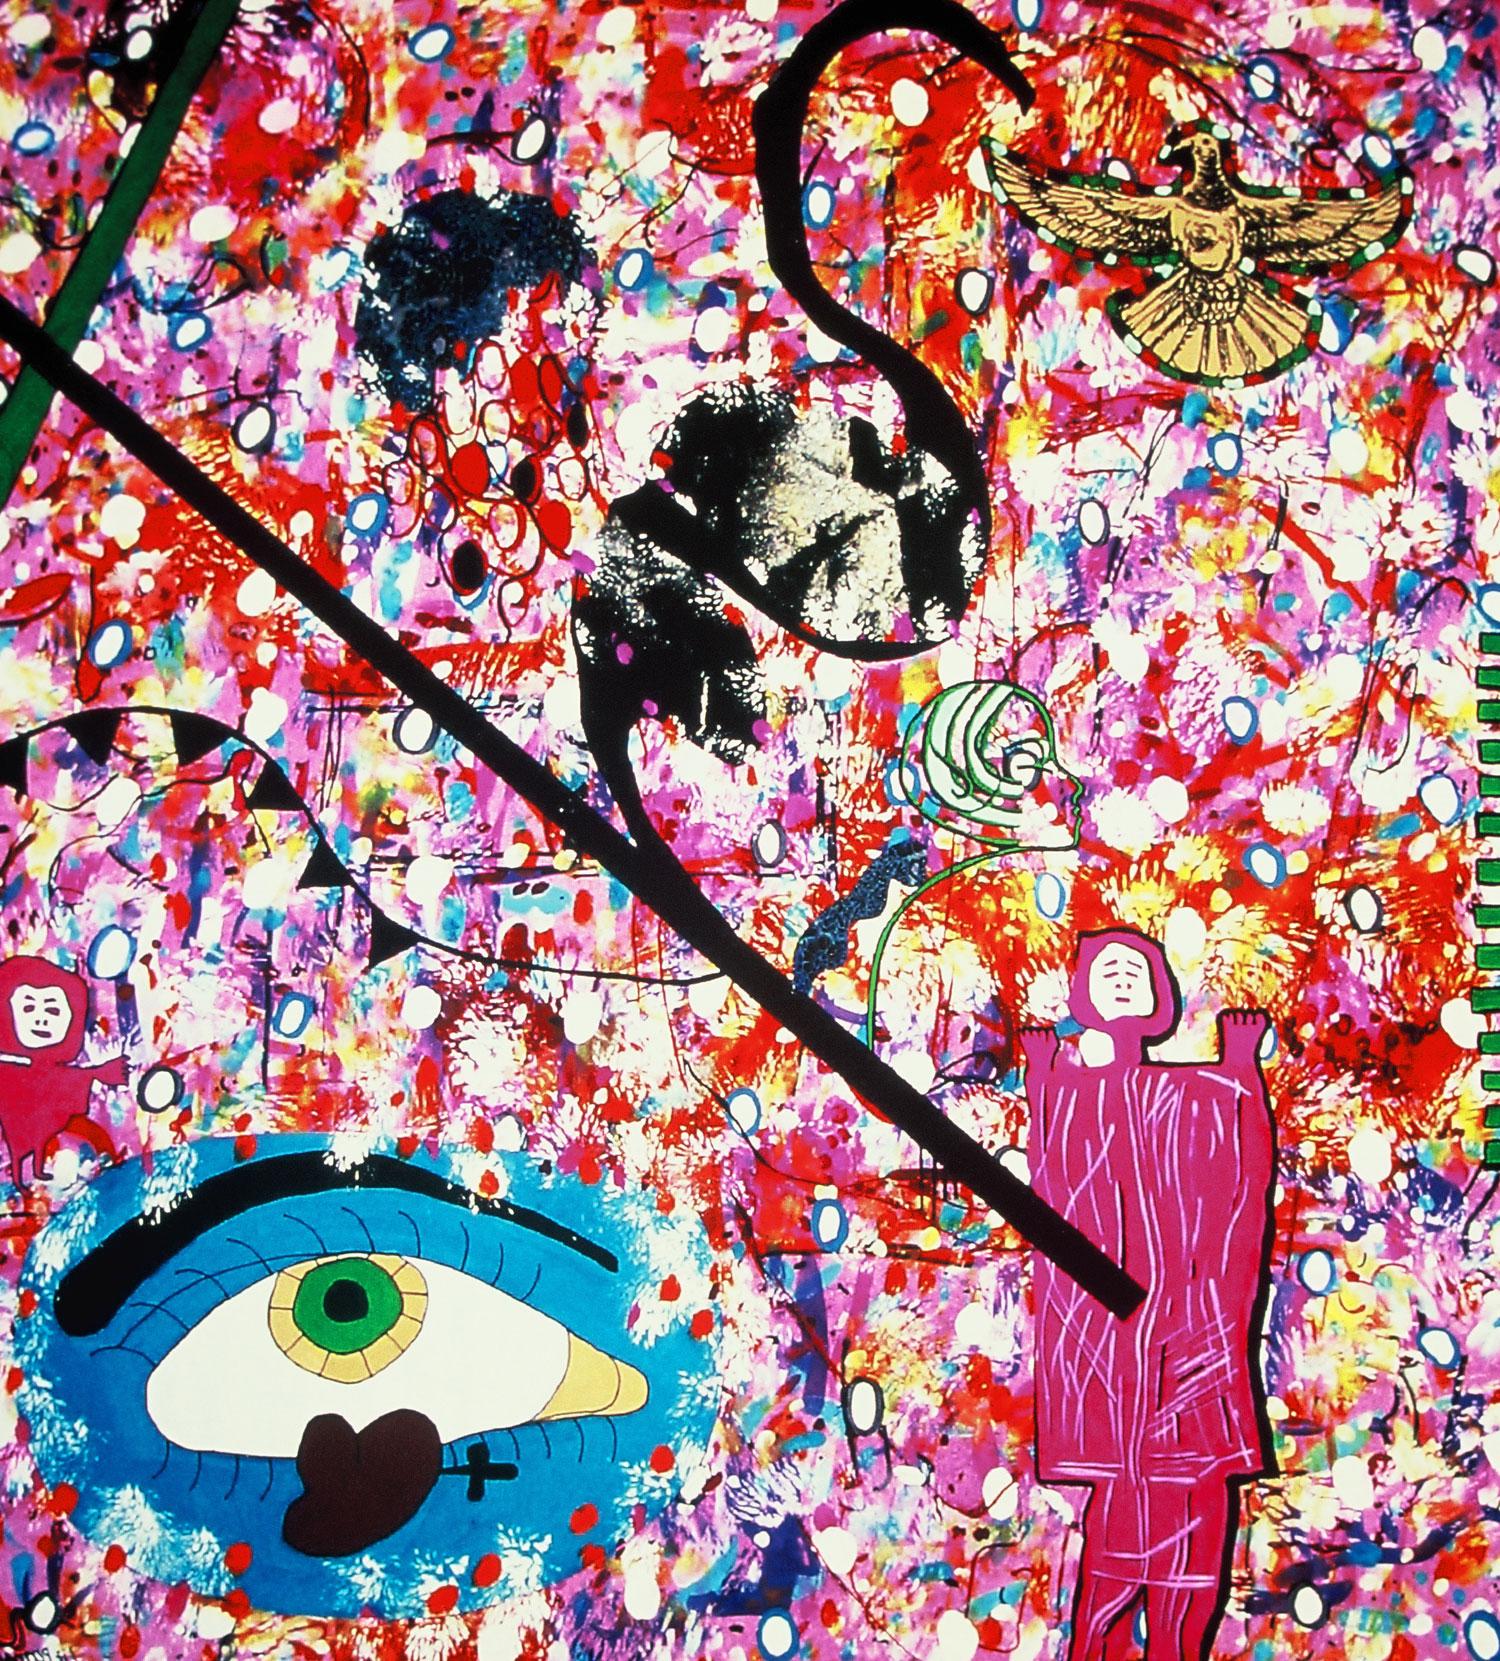 """Blue Eyes"" by Liz (Perman) Nehdi, 2003"